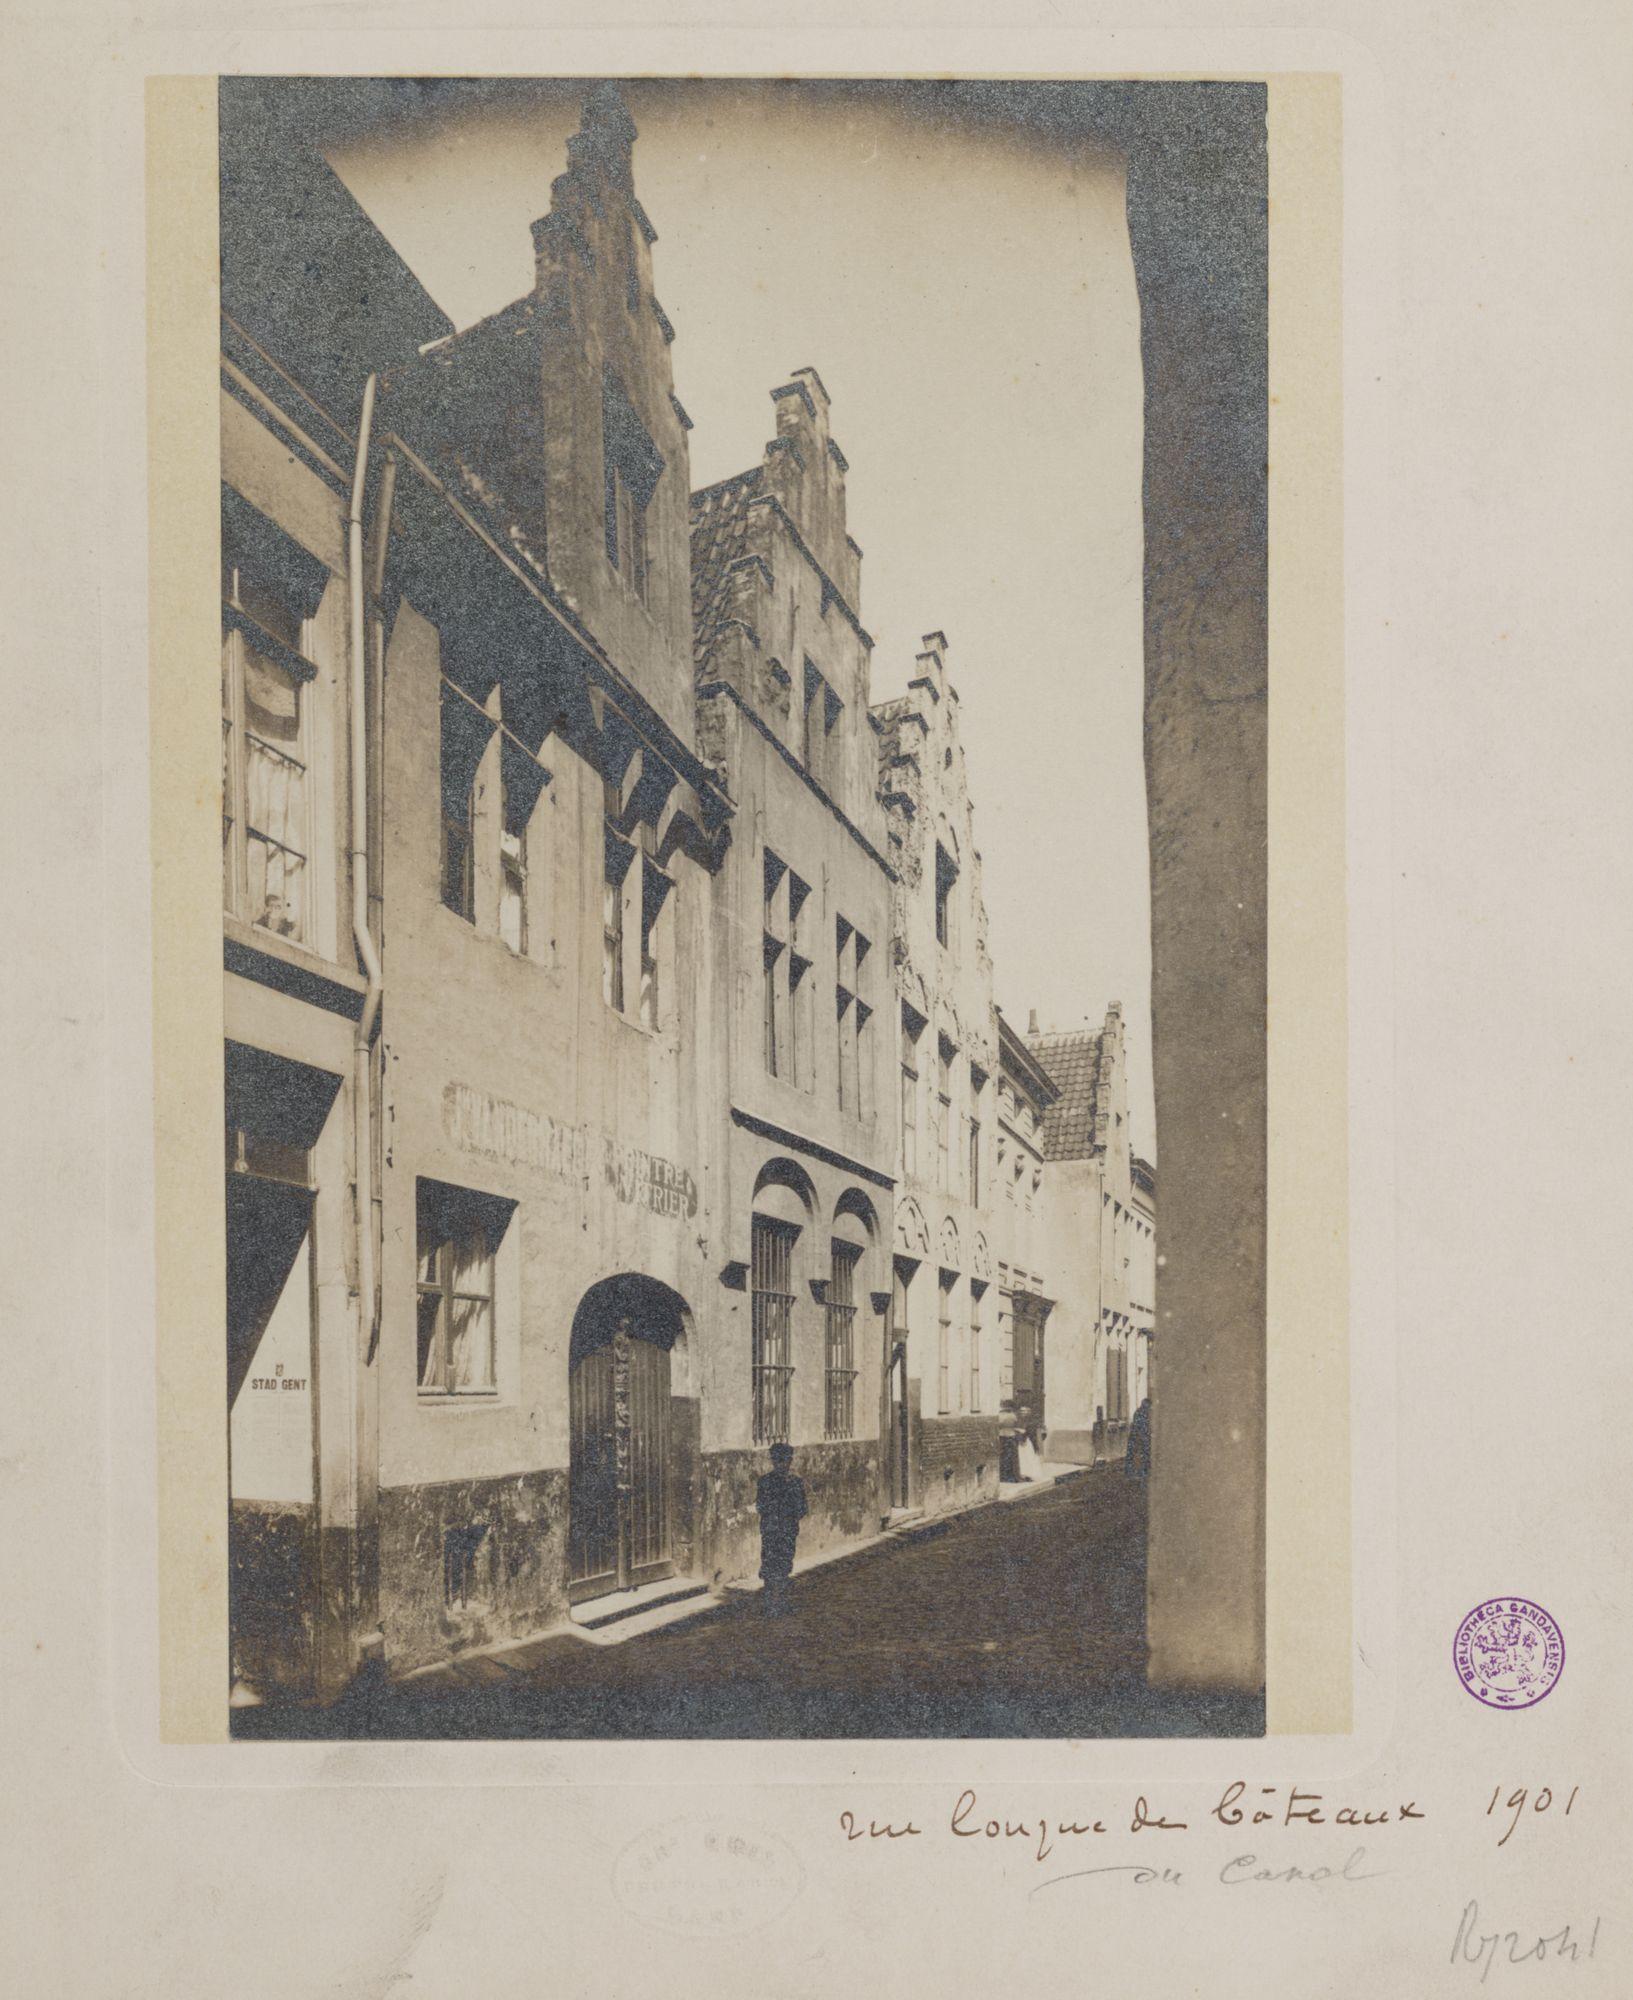 Gent: Trapgevelhuizen, Lange Schipgracht